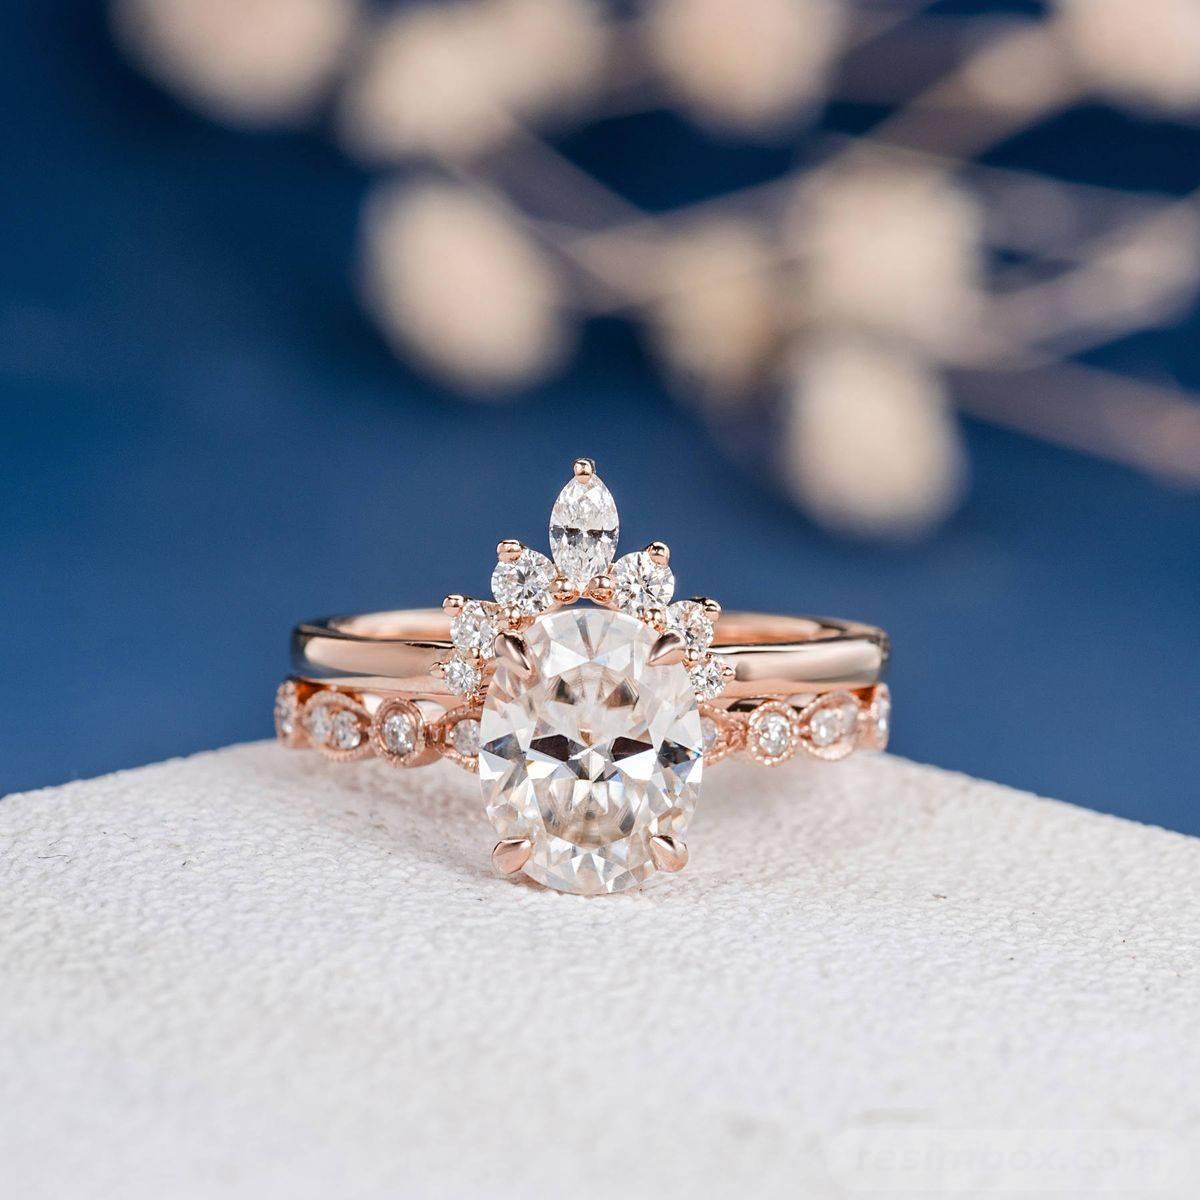 Art deco jewelry-471118811018243072